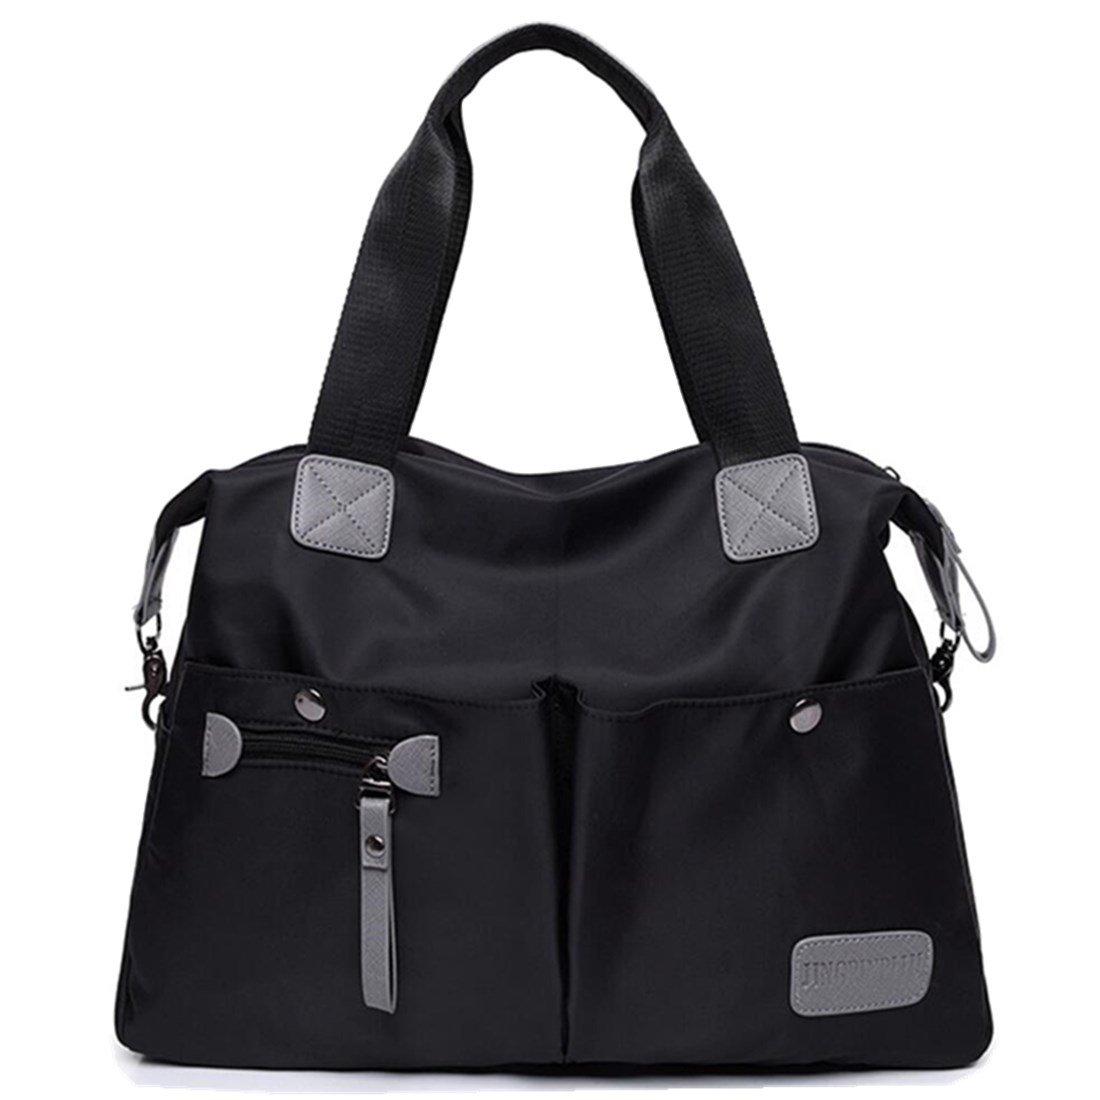 YouNuo Women's Casual Water-resistant Nylon Handbag Portable Lightweight Top Handle Totes Shoulder Bags